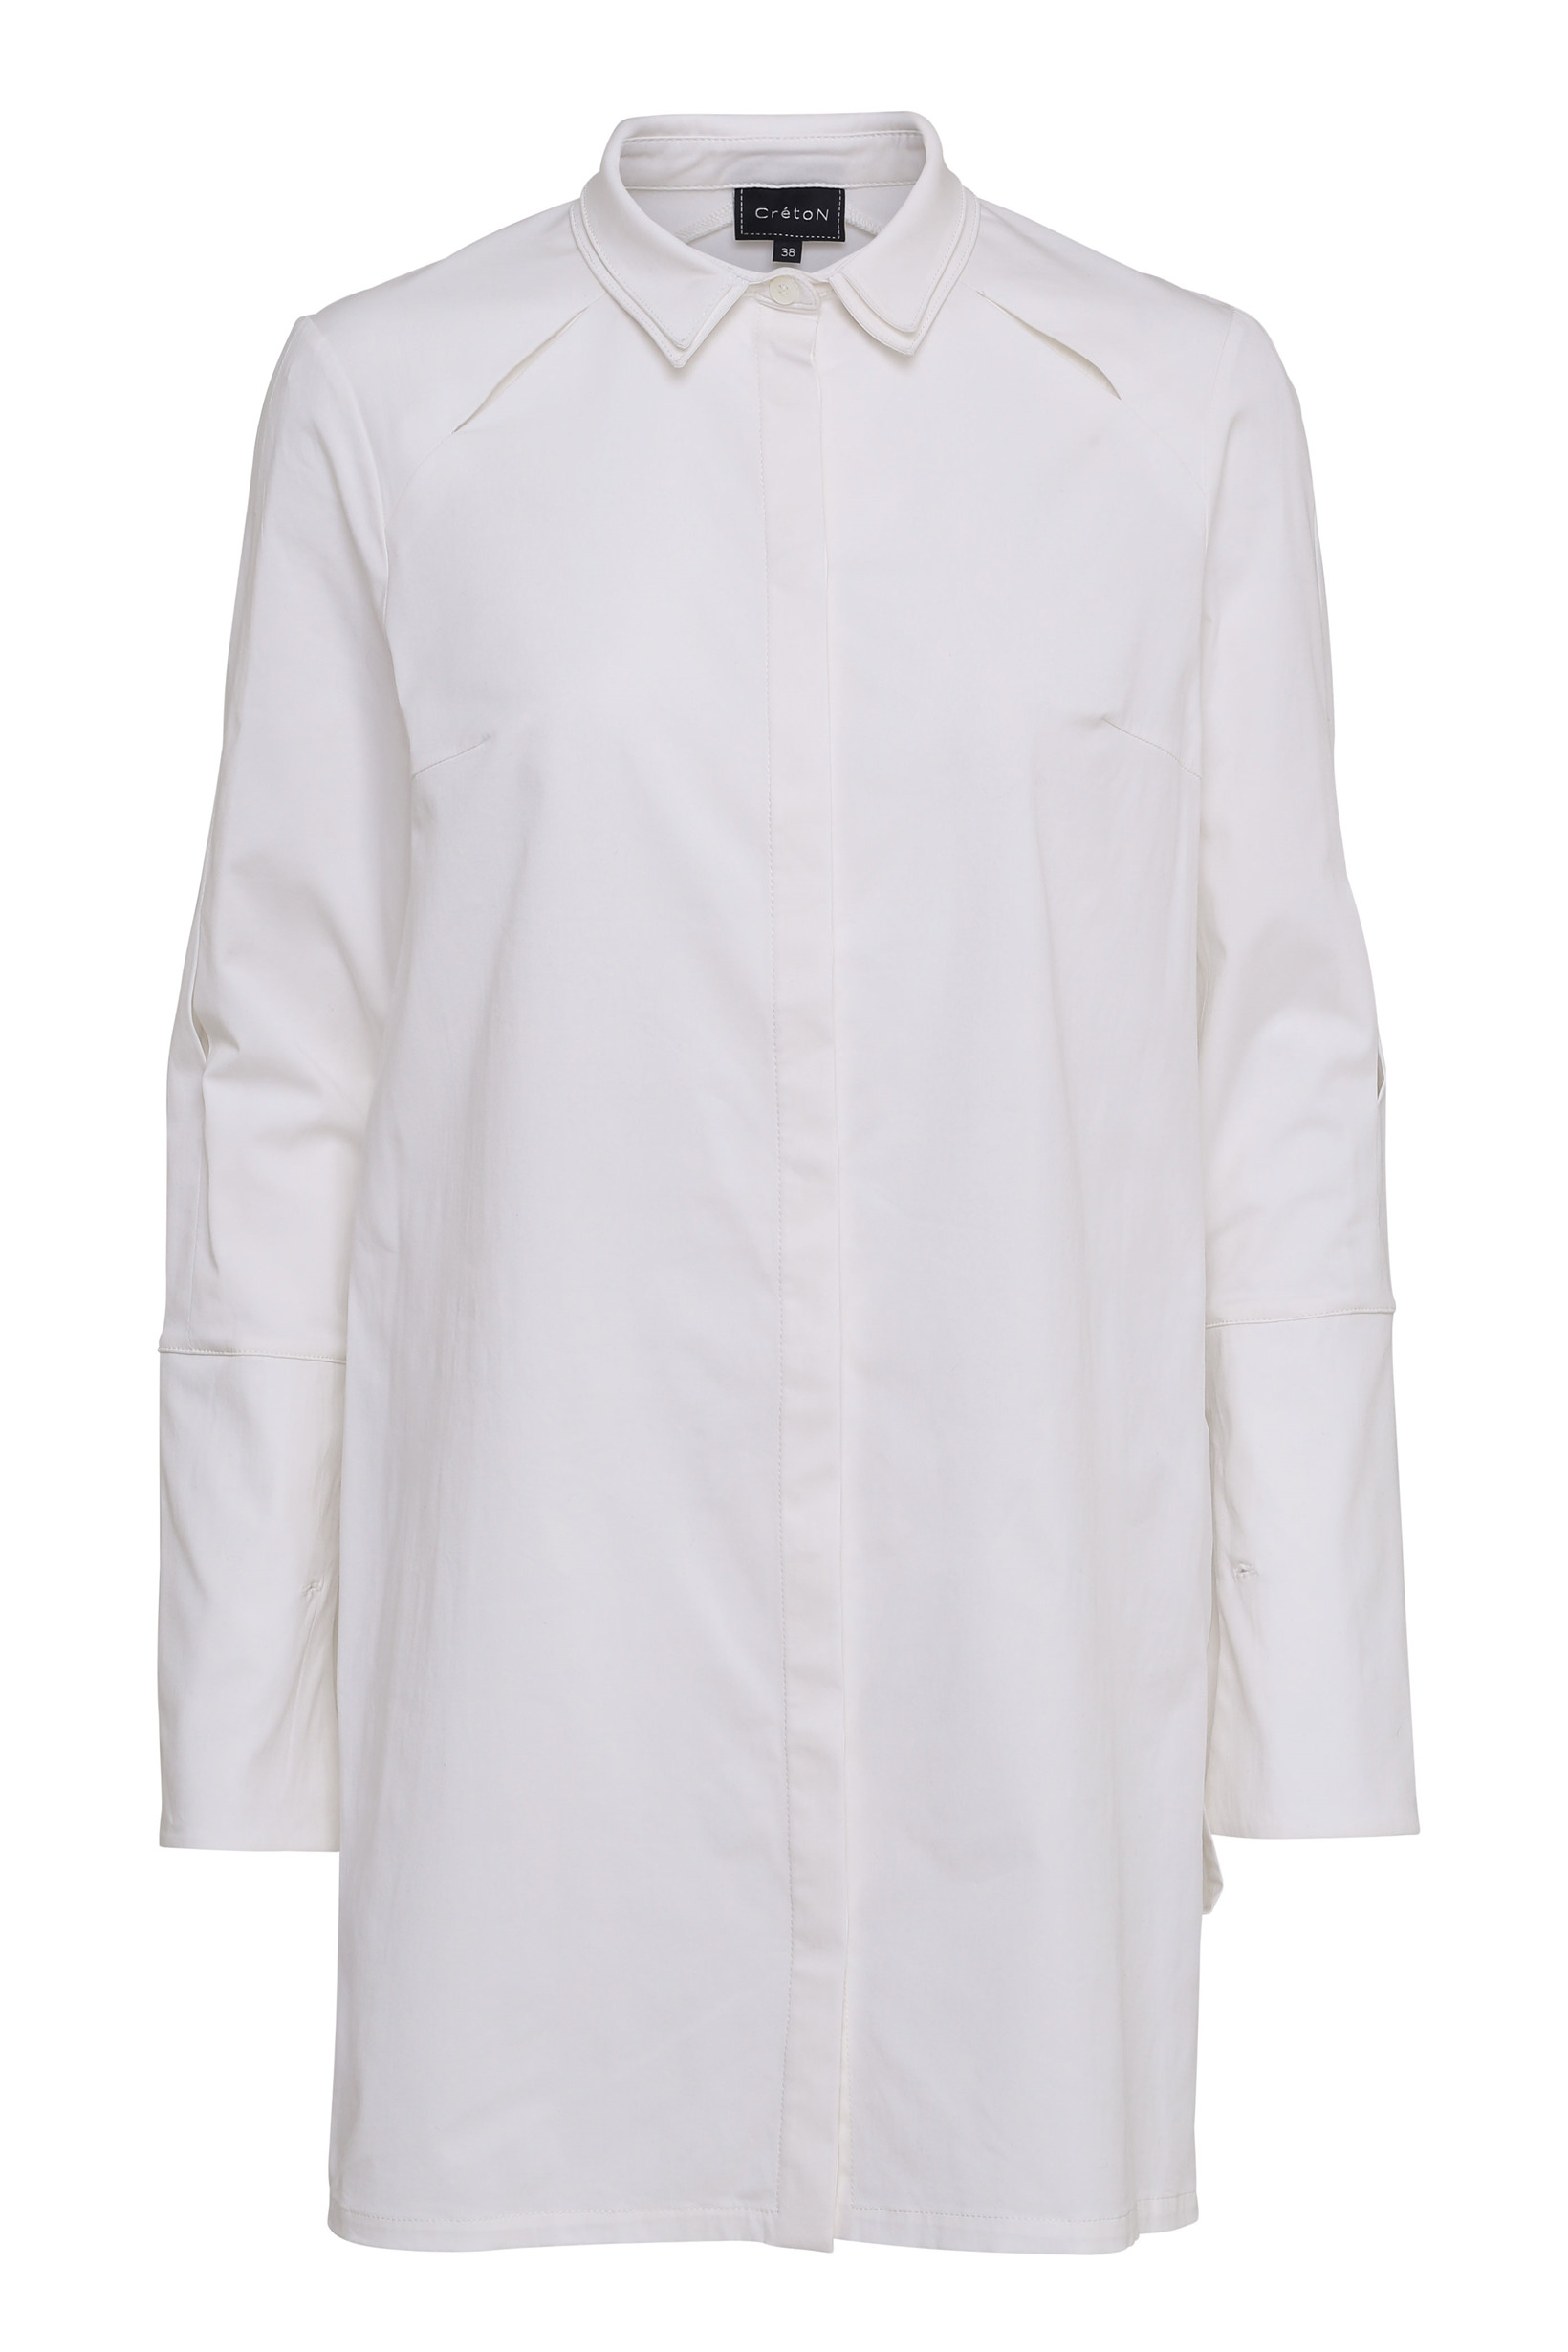 CRÉTON Agnee lang skjorte X01 34